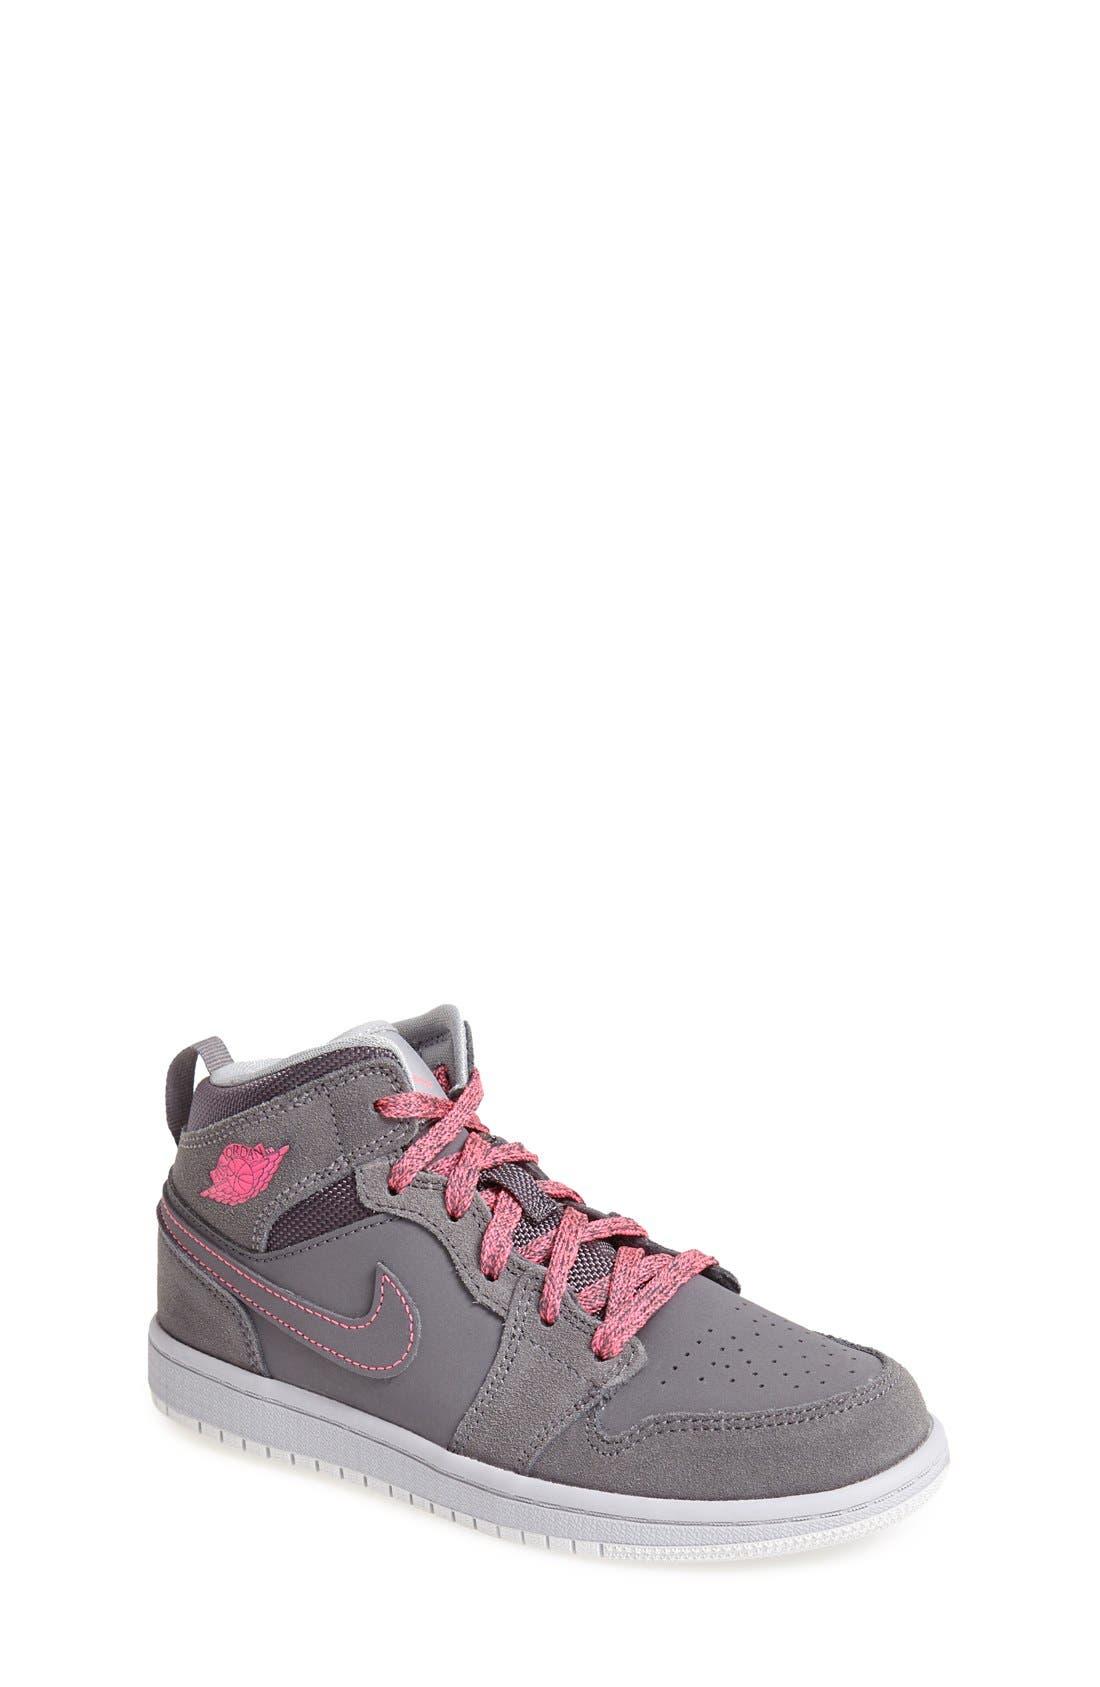 Alternate Image 1 Selected - Nike 'Air Jordan 1 Mid' Sneaker (Toddler & Little Kid)